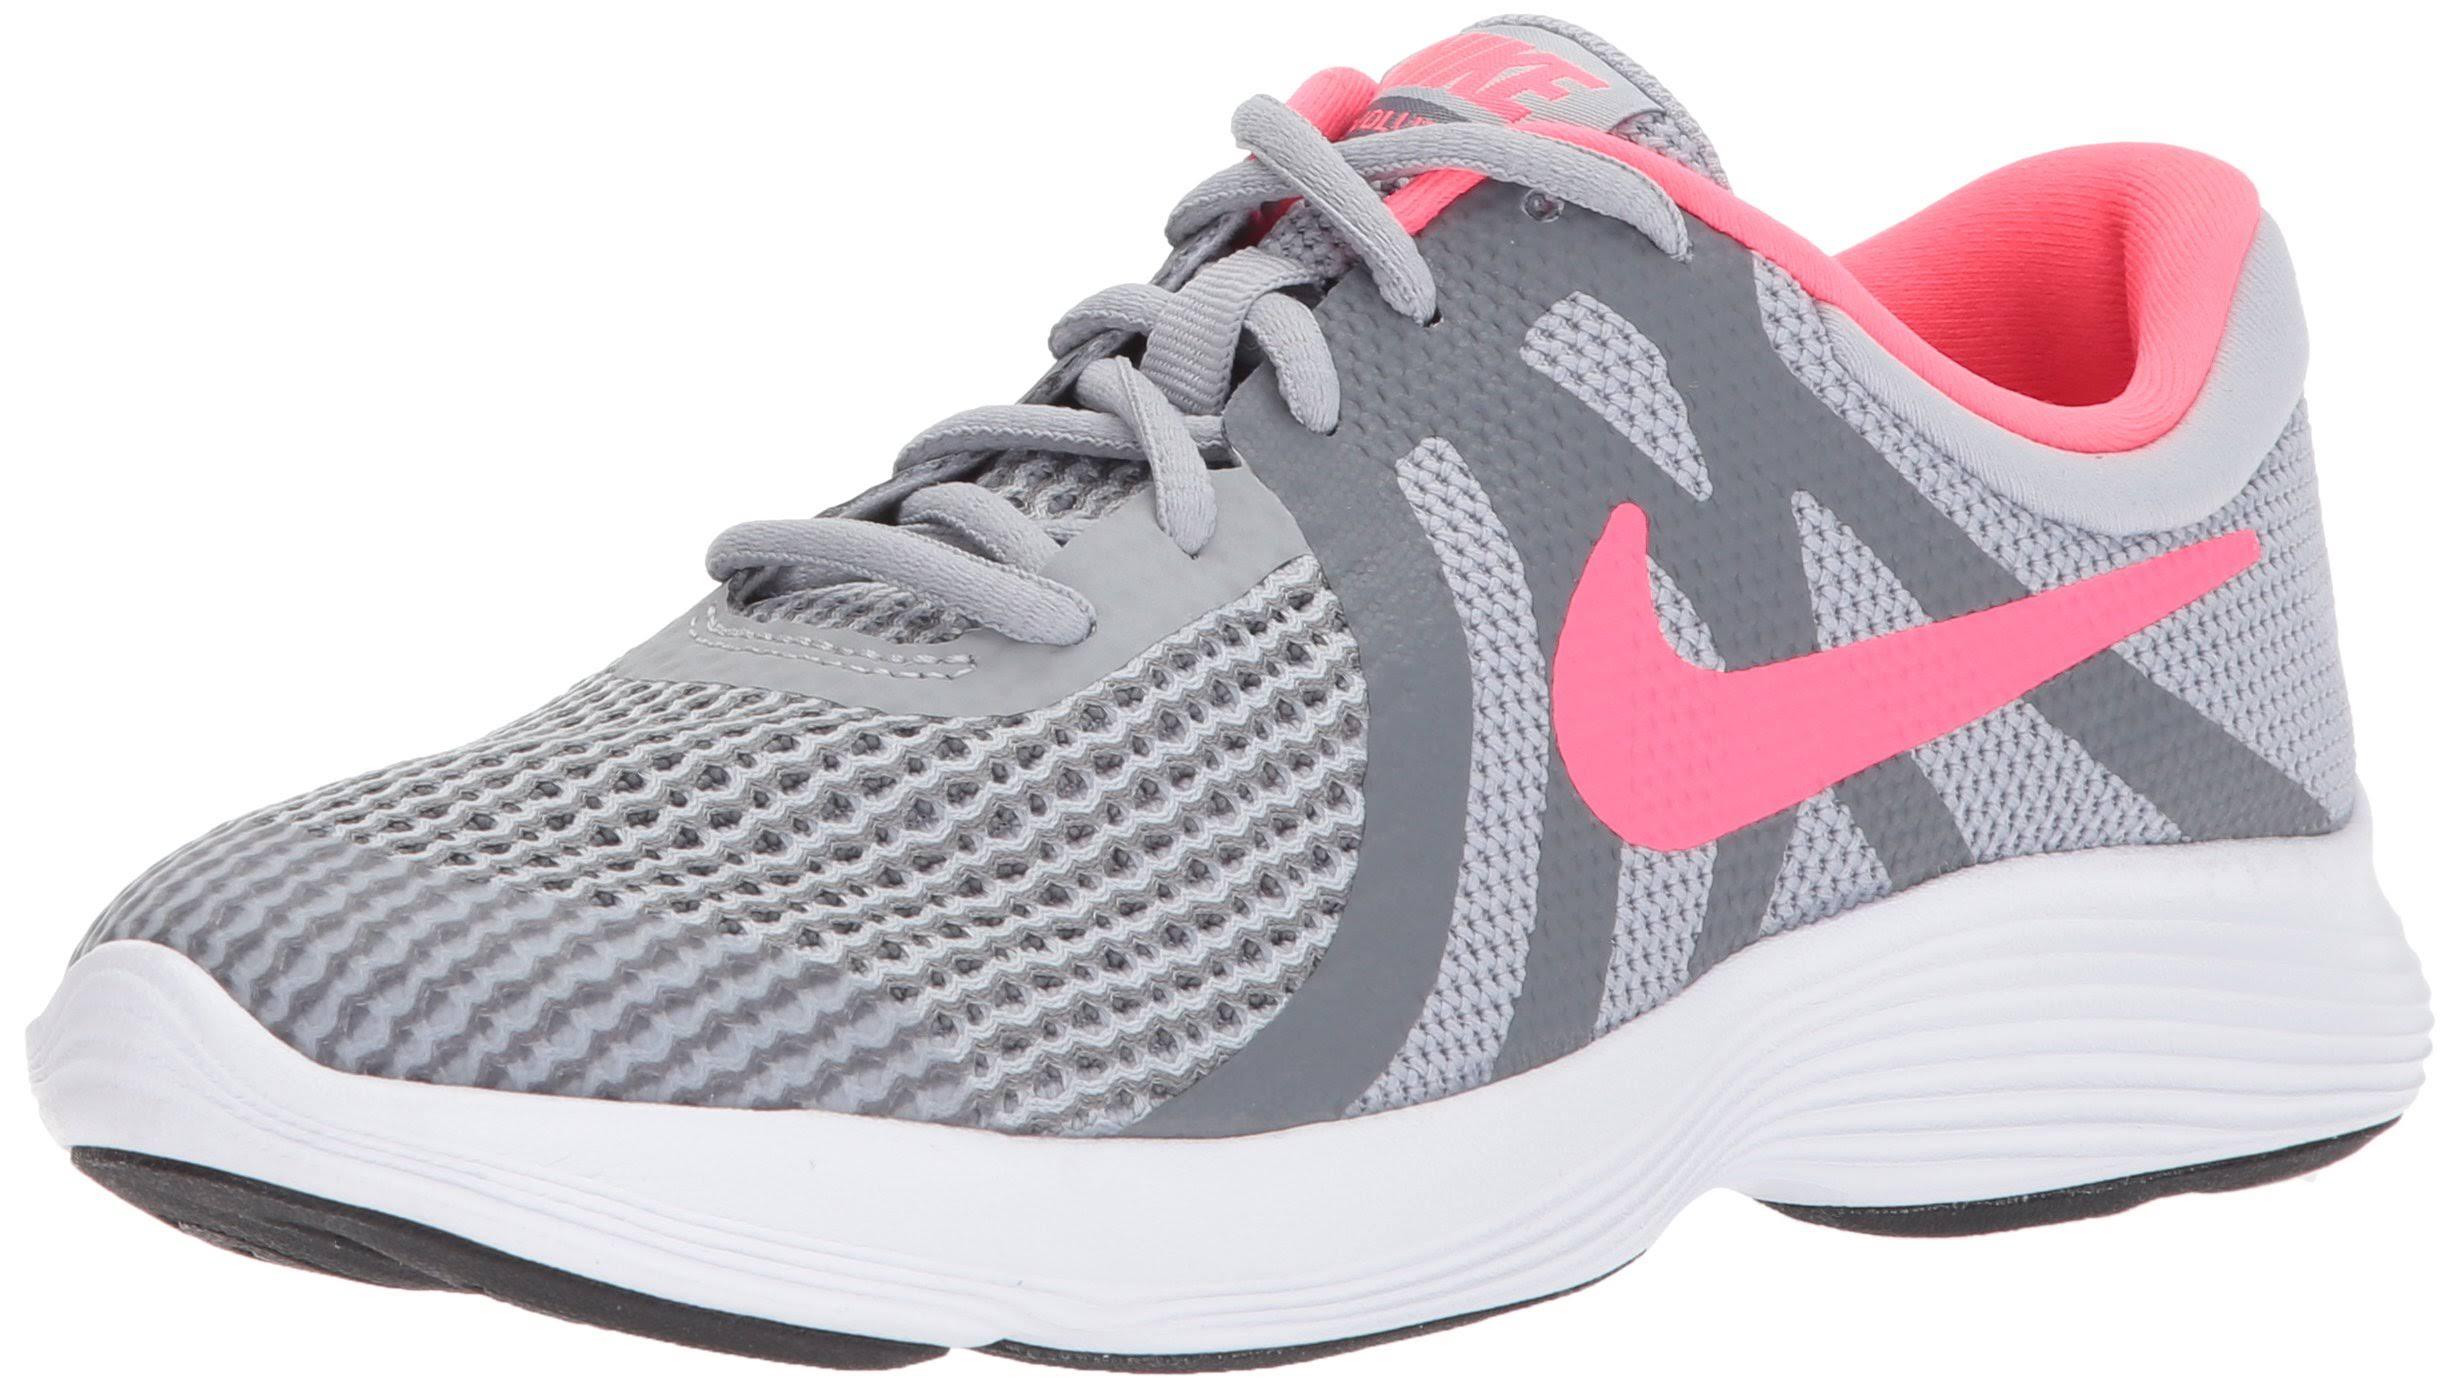 Kid's Taglia Revolution 6 SneakersGrigio Running Nike 4 5 rsdChtQ